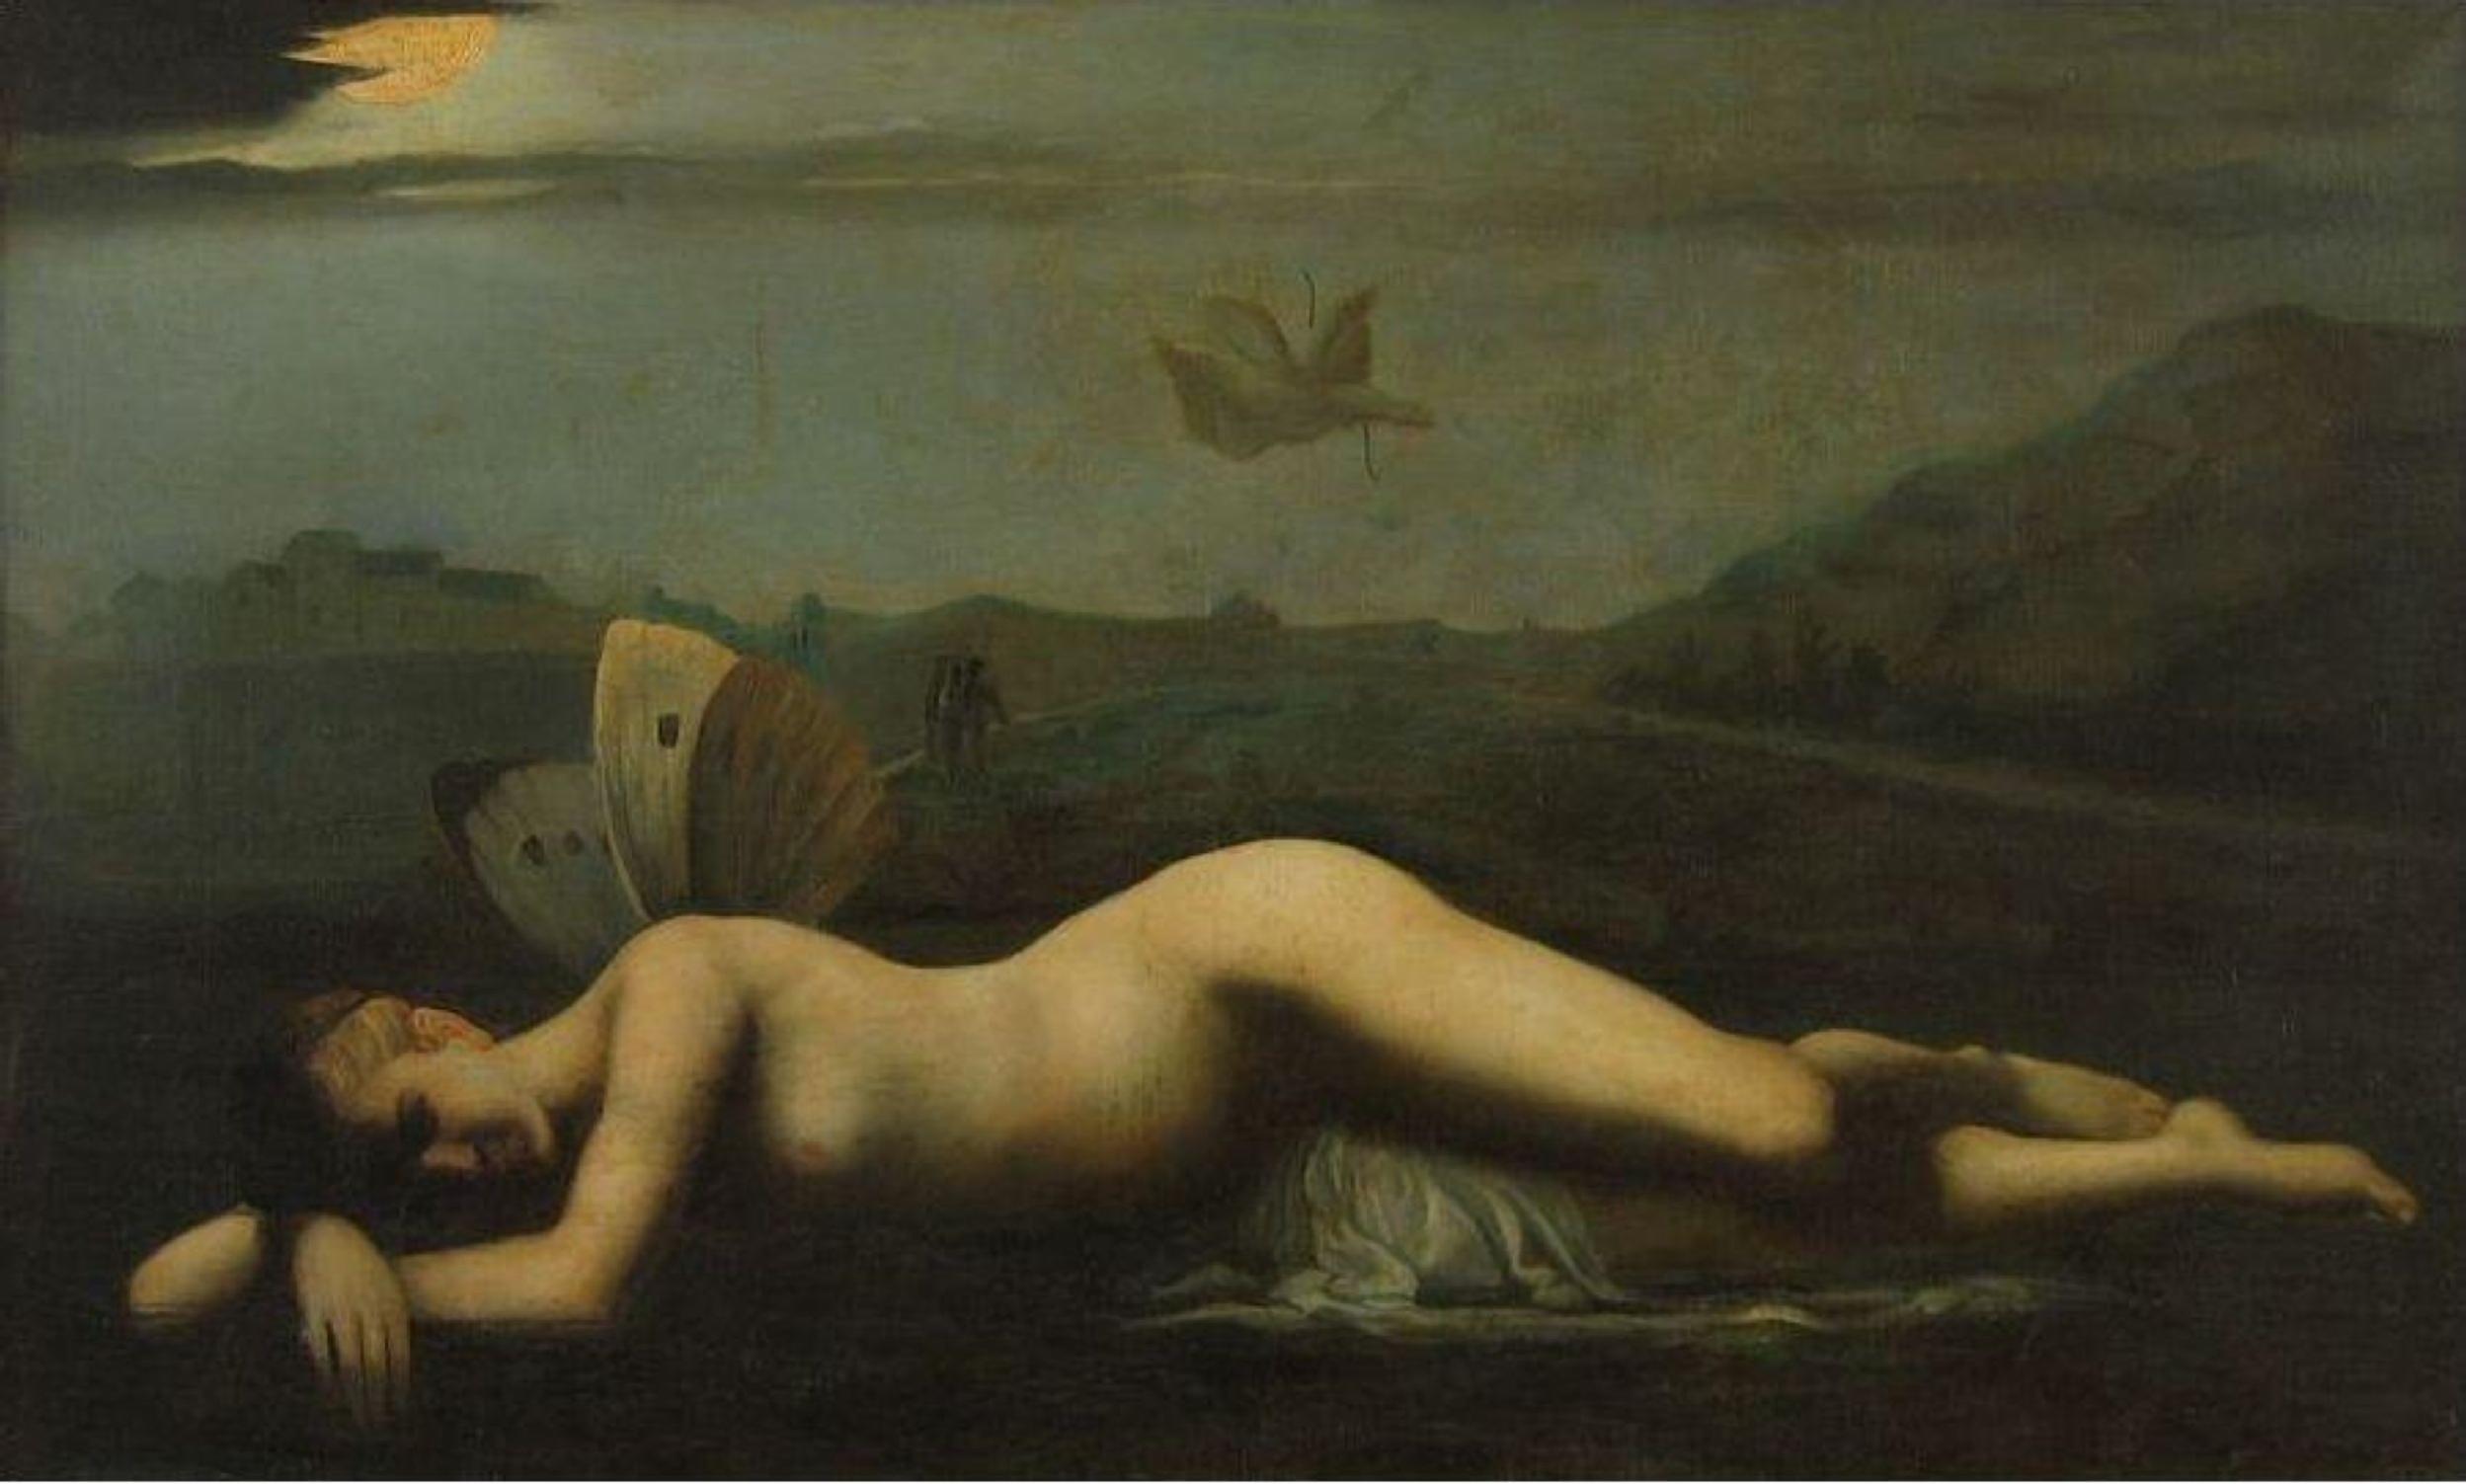 Hentia Pics for file:sava hentia - psyche parasita de amor - wikimedia commons